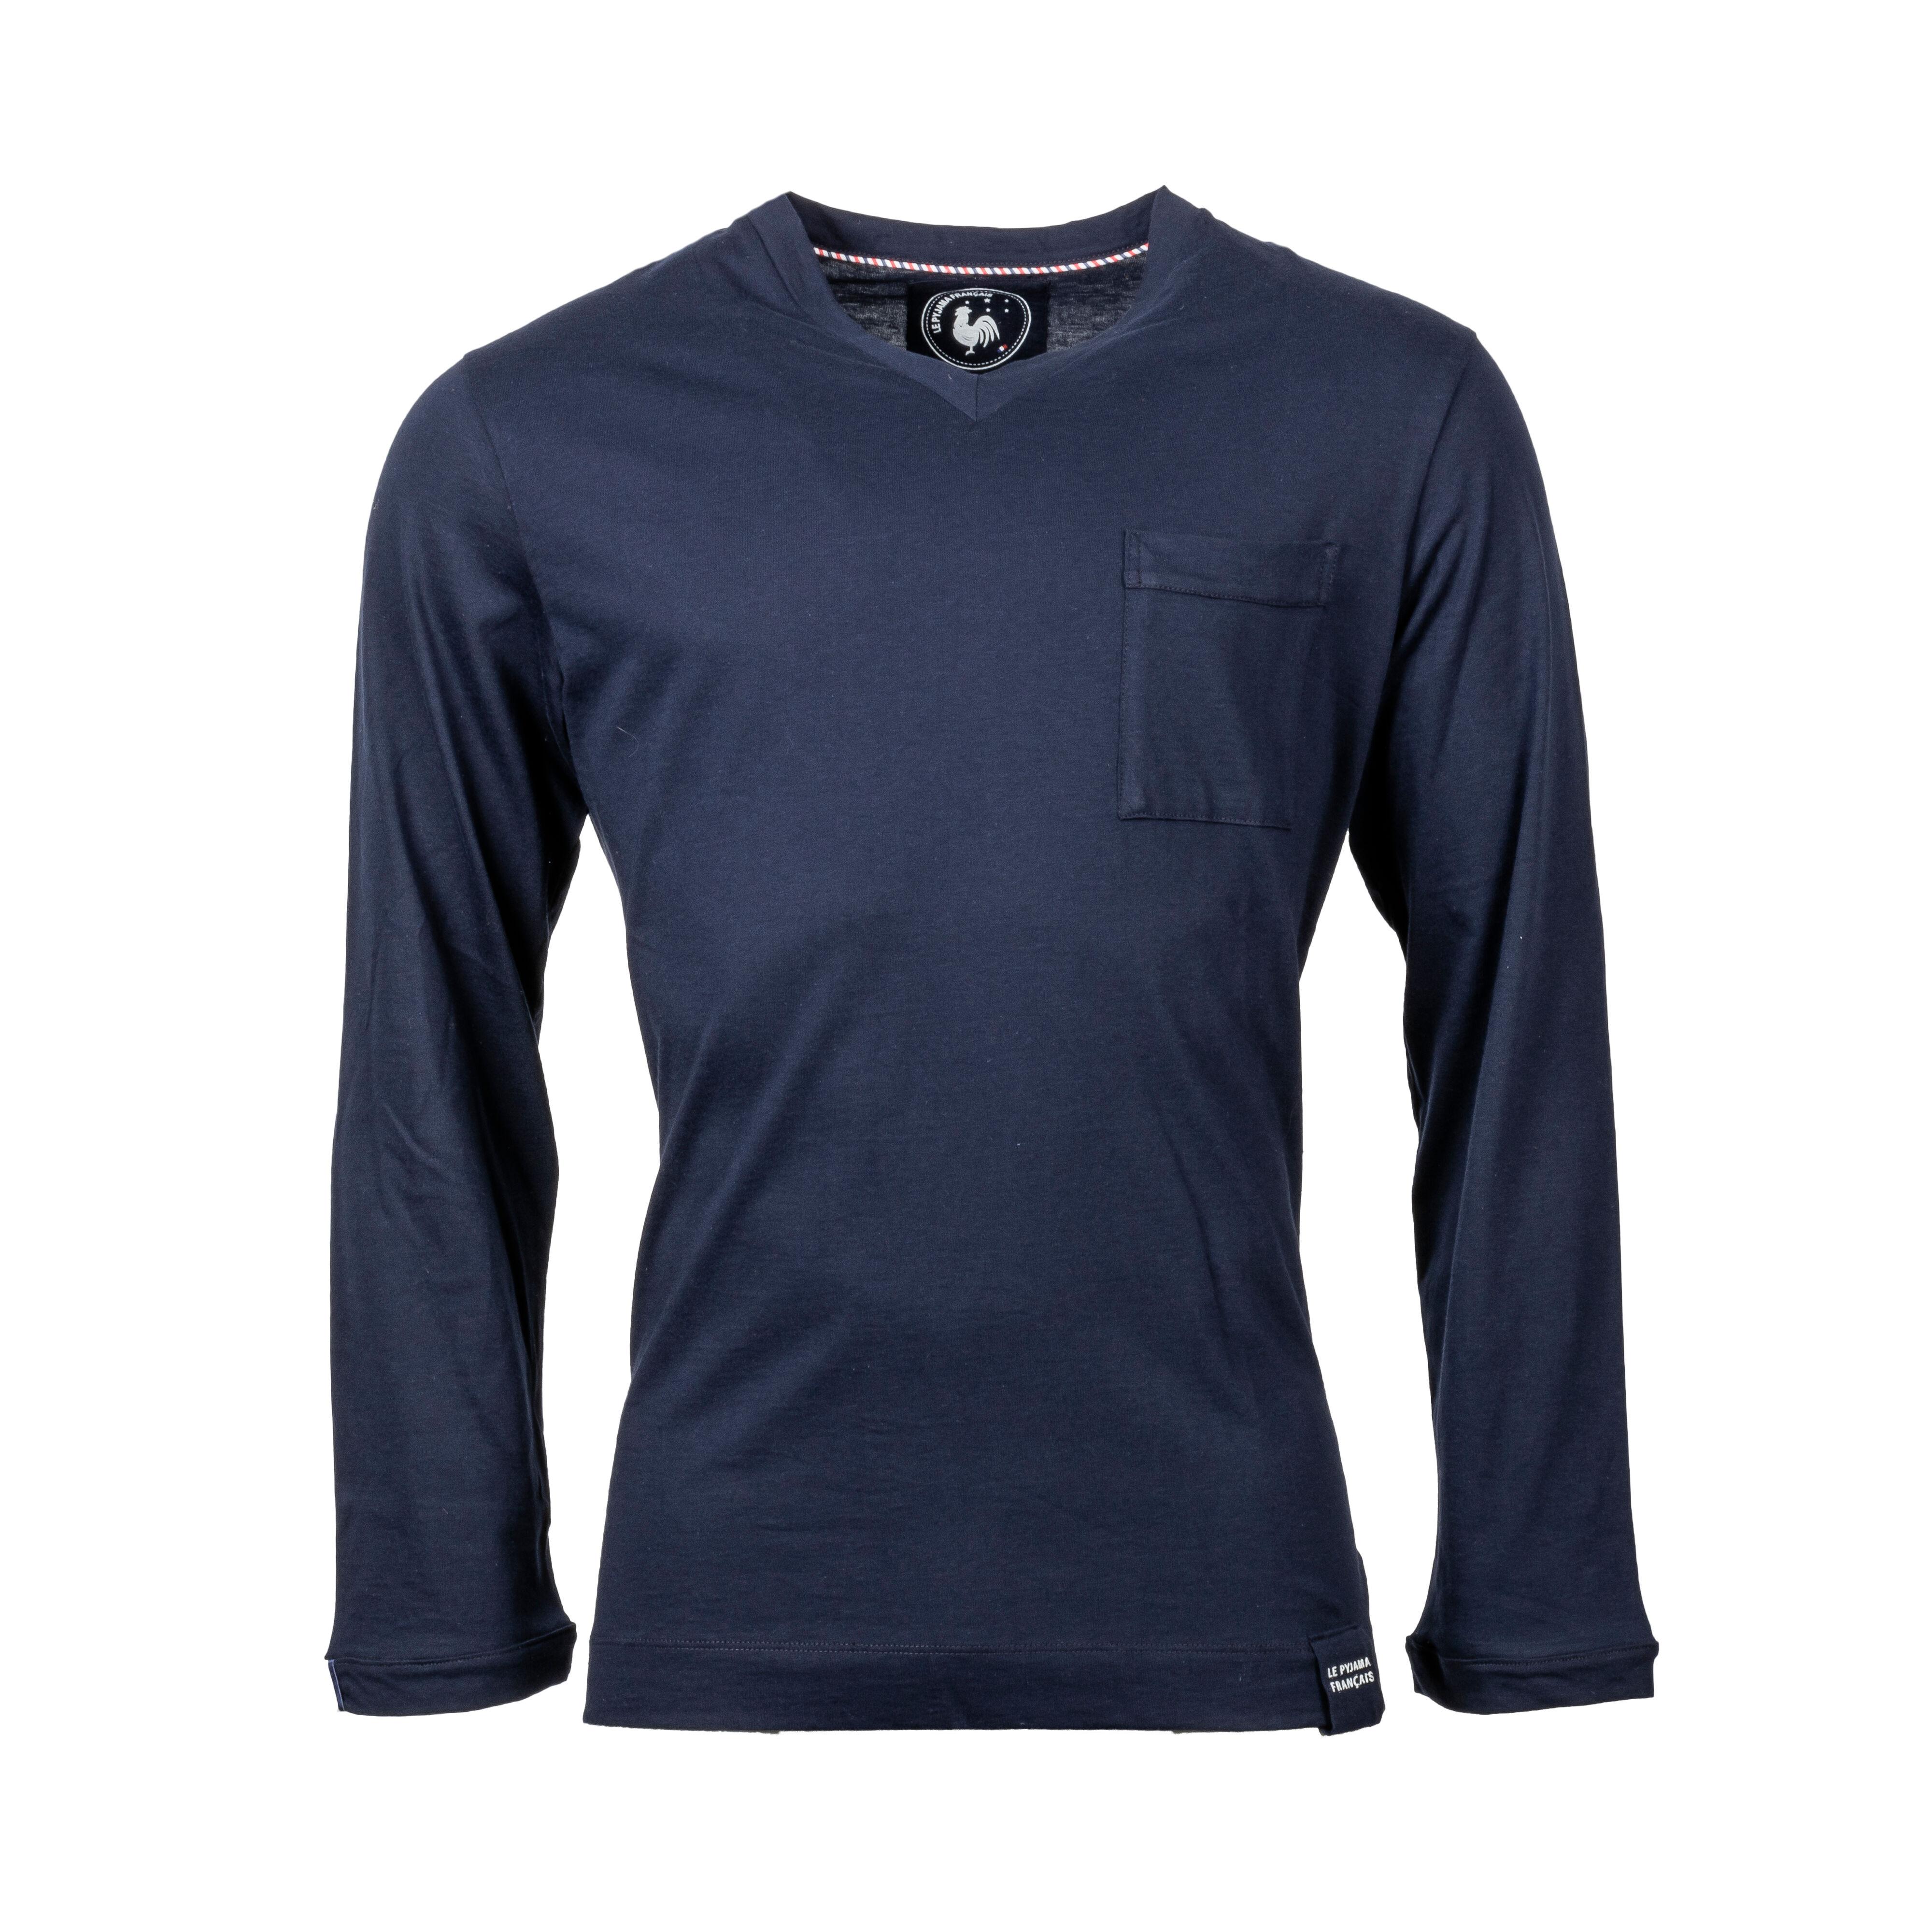 Le Pyjama Français Tee-shirt de pyjama manches longues Made in France Le Pyjama Français en coton bleu marine - BLEU -